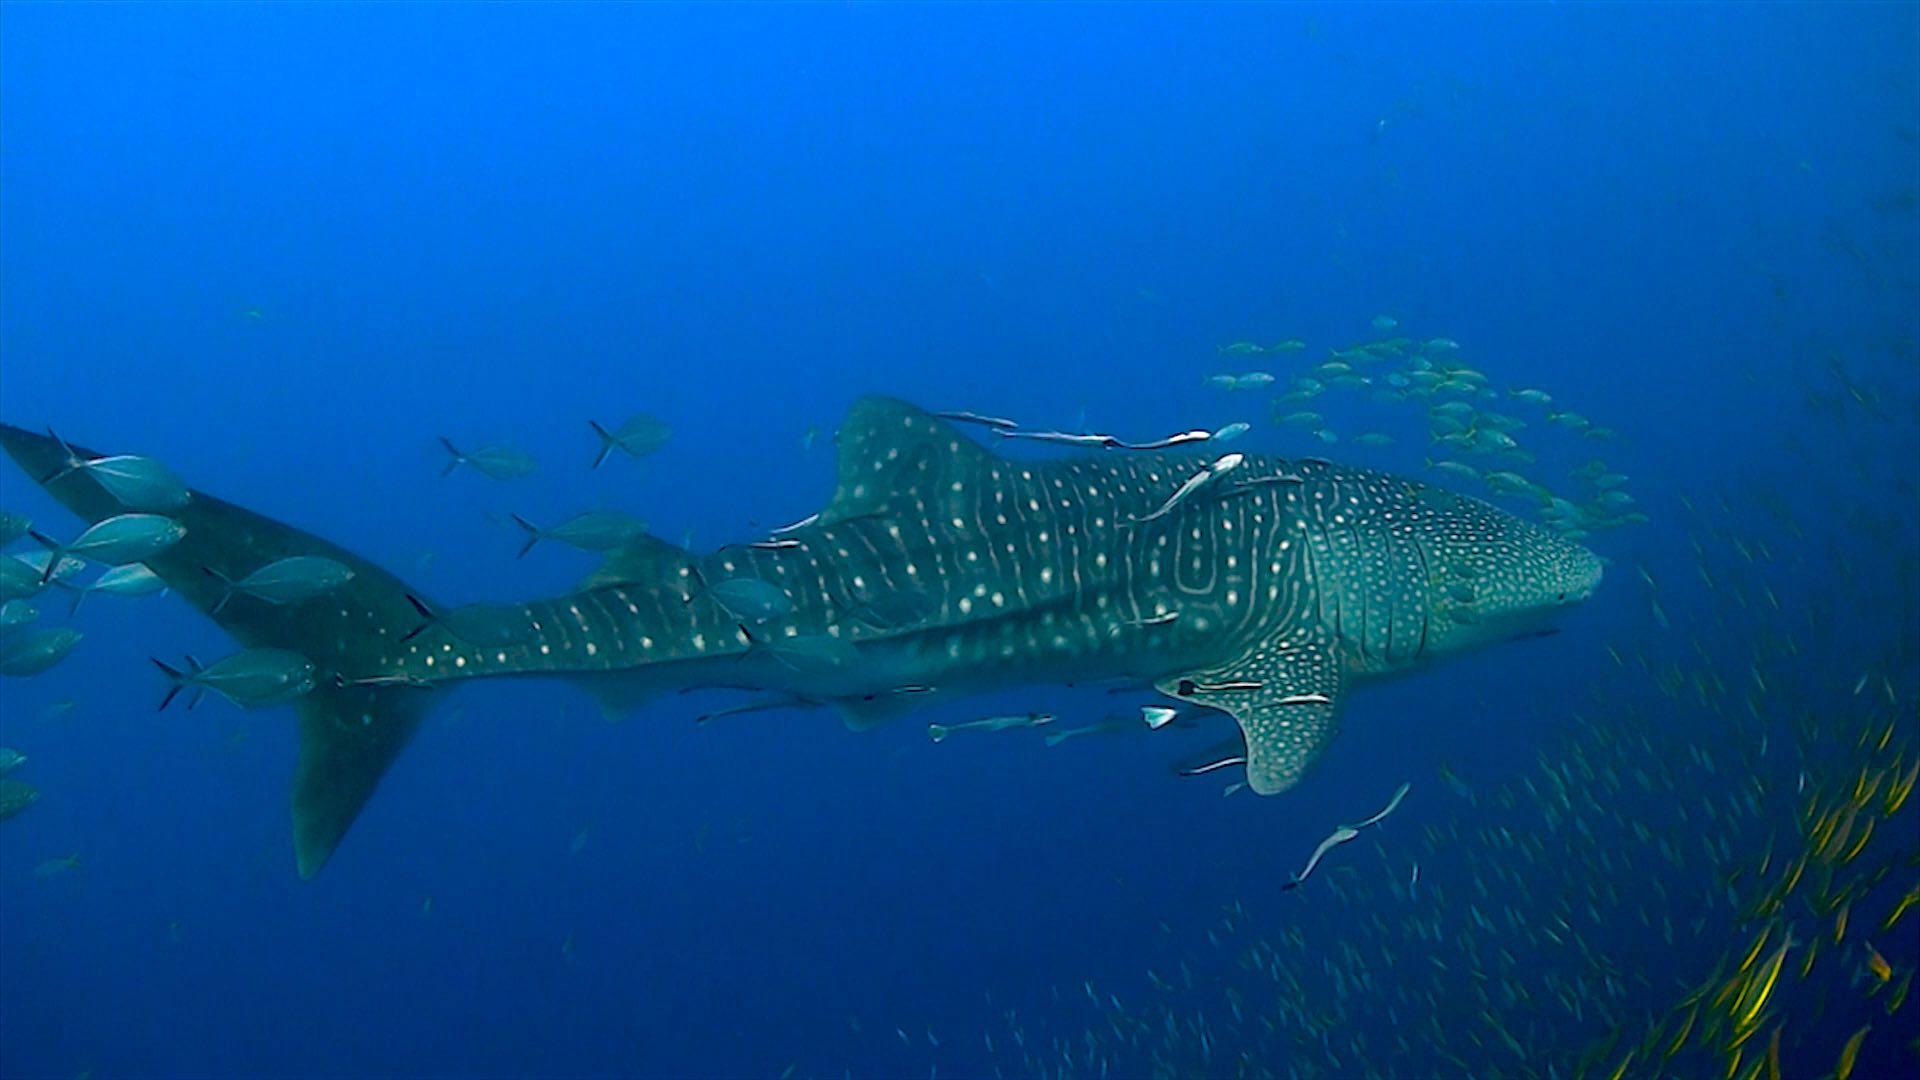 www.thefunkyturtle.com chumphon dive site koh tao whaleshark